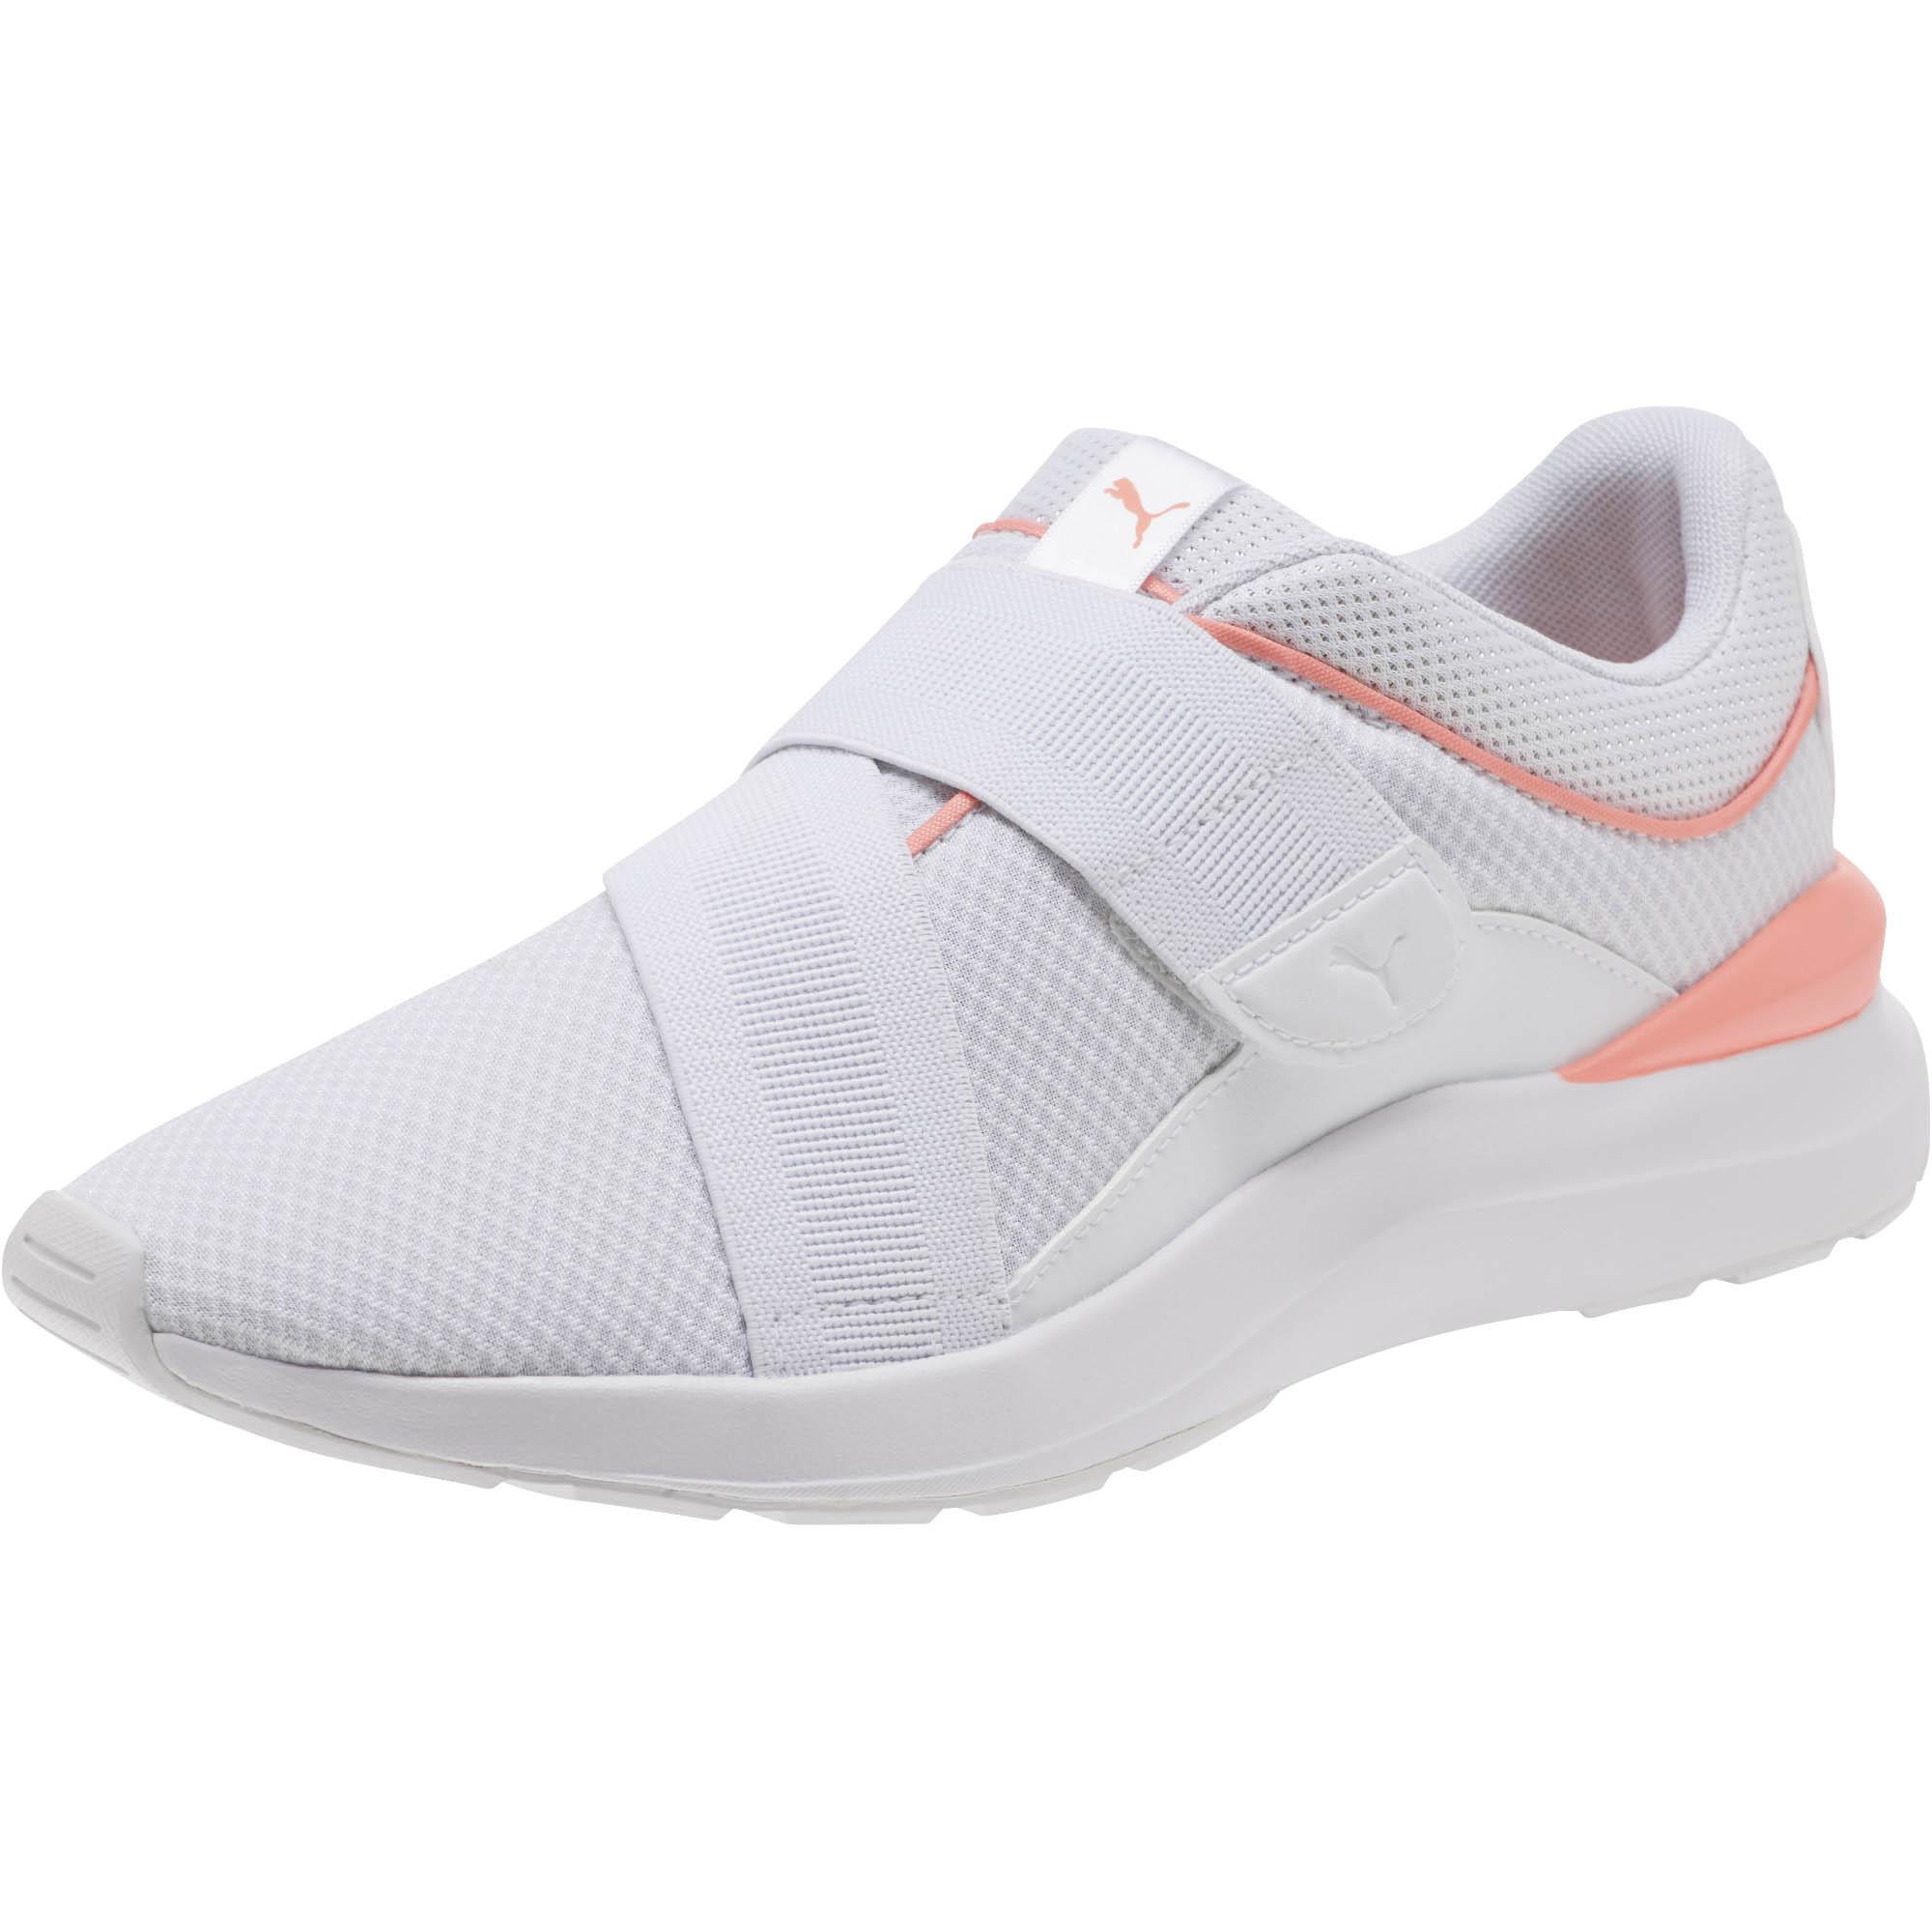 PUMA-Adela-X-Women-s-Sneakers-Women-Shoe-Basics thumbnail 16